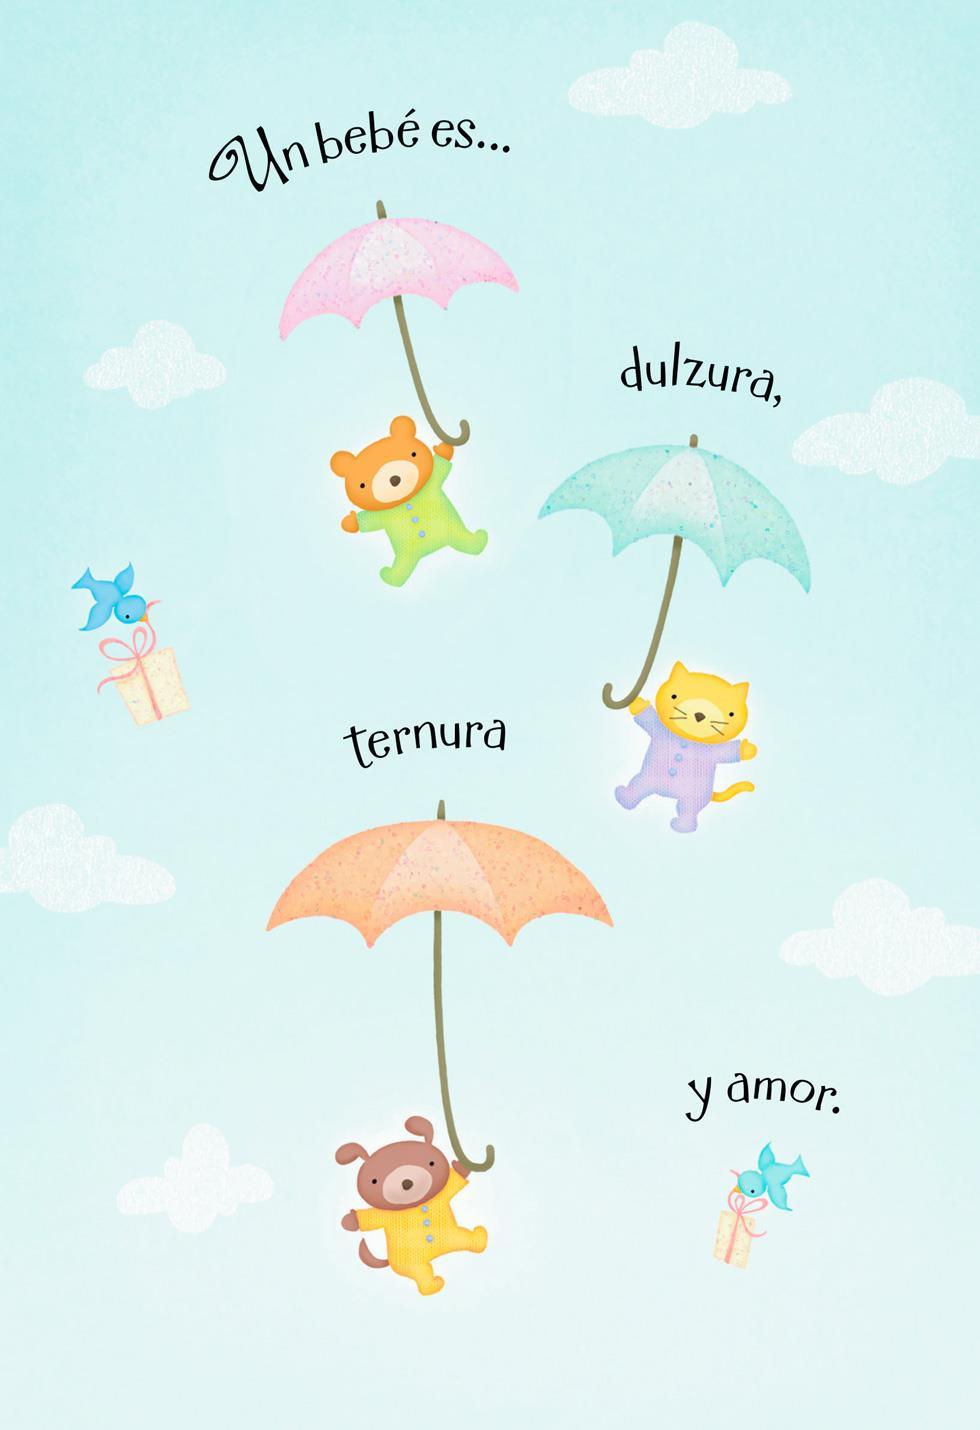 teddy bear umbrellas spanish language new baby card greeting cards